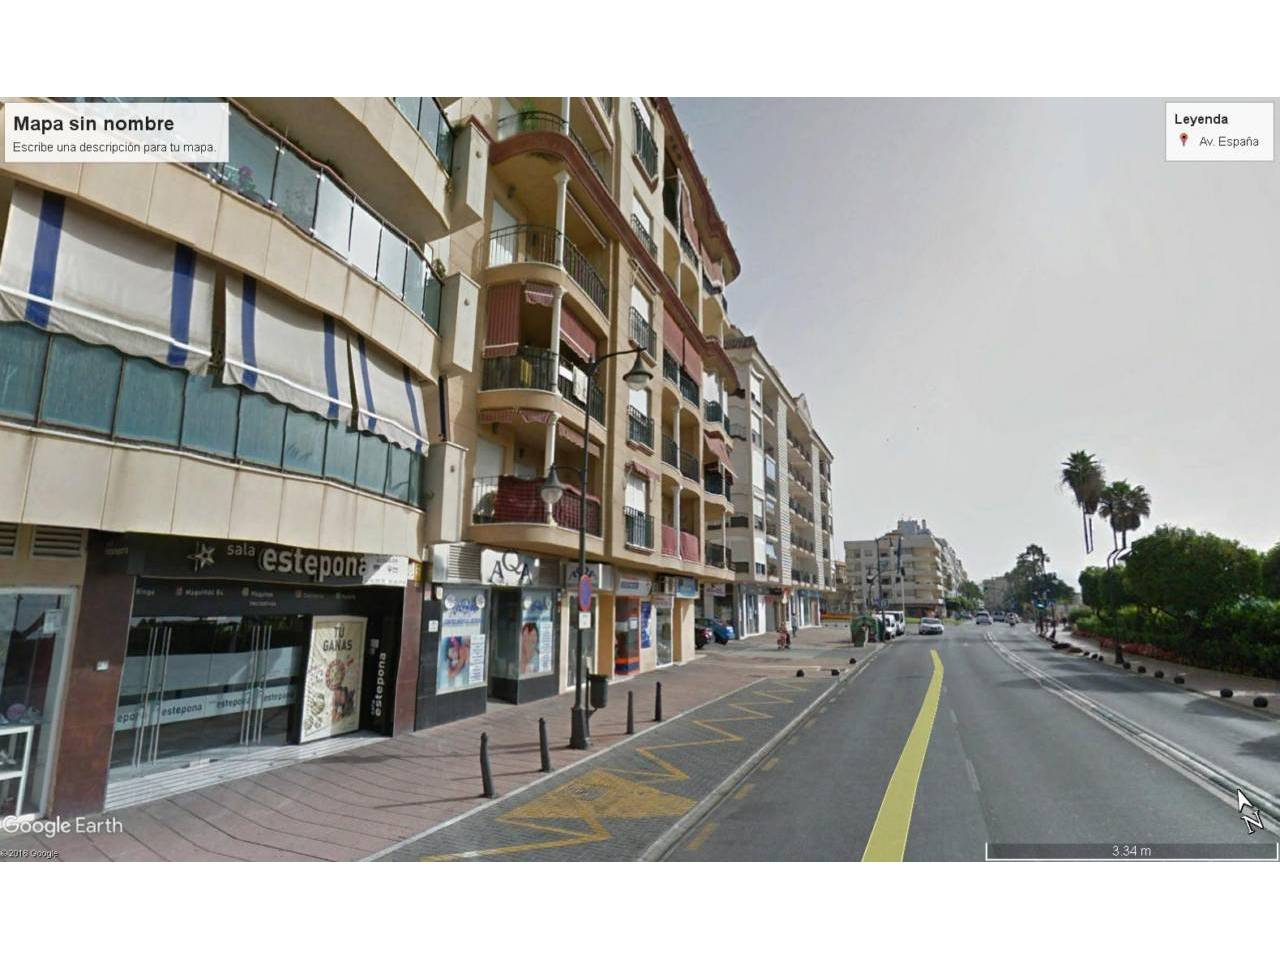 Local en venta en Estepona en Avenida: españa